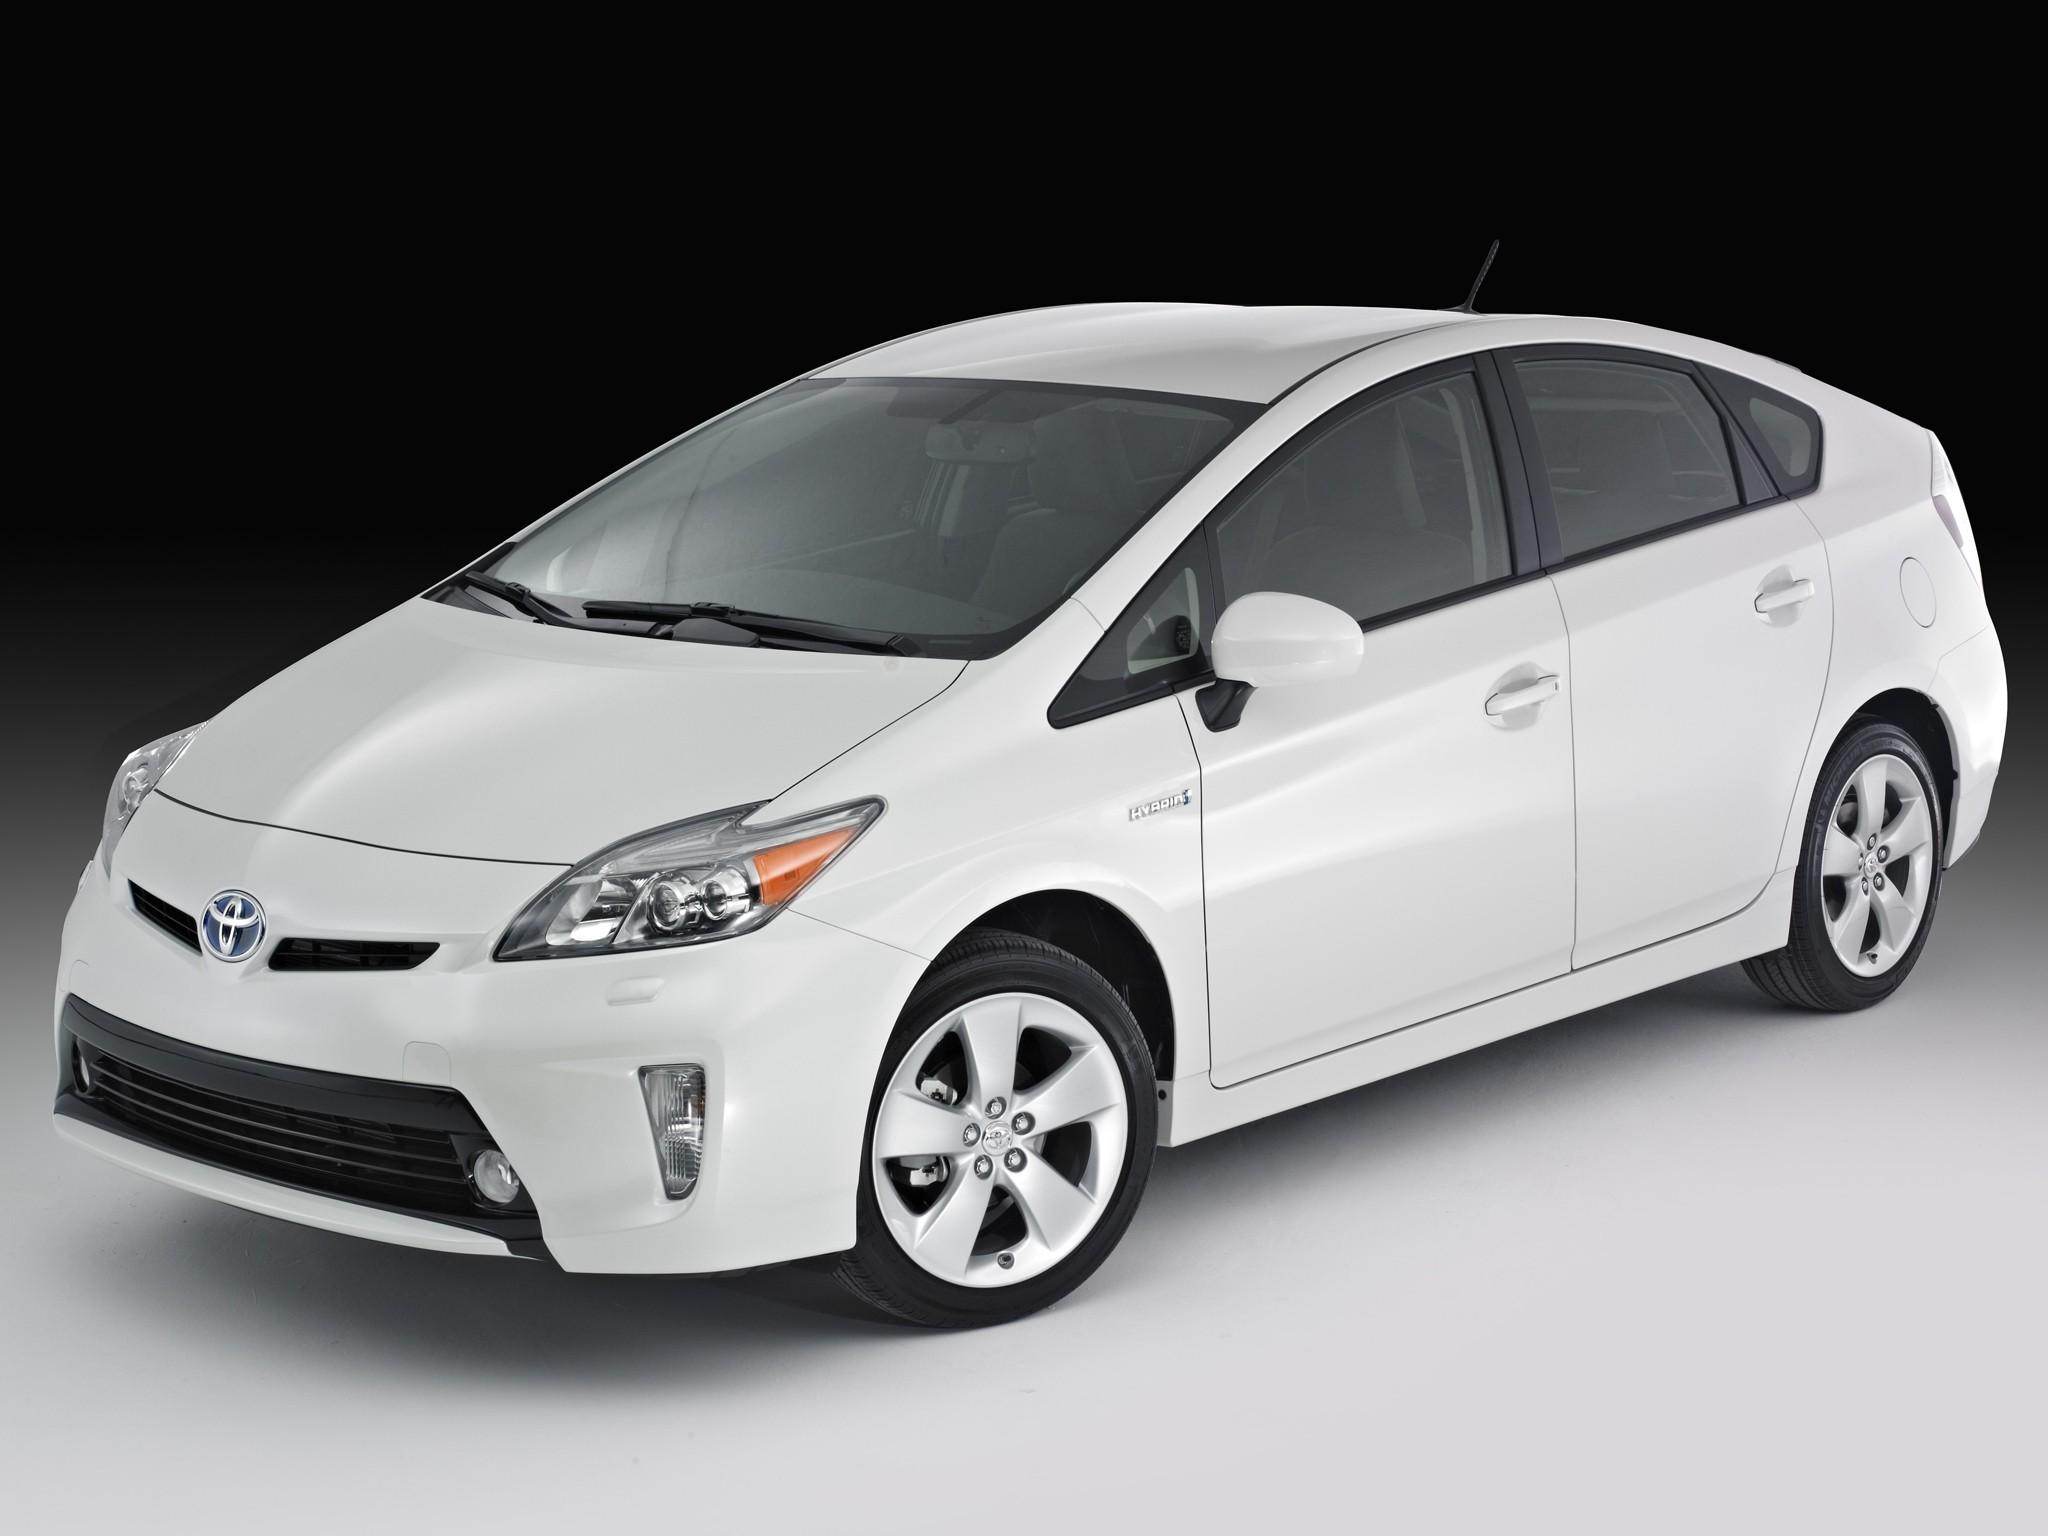 Toyota Prius Specs 2011 2012 2013 2014 2015 2016